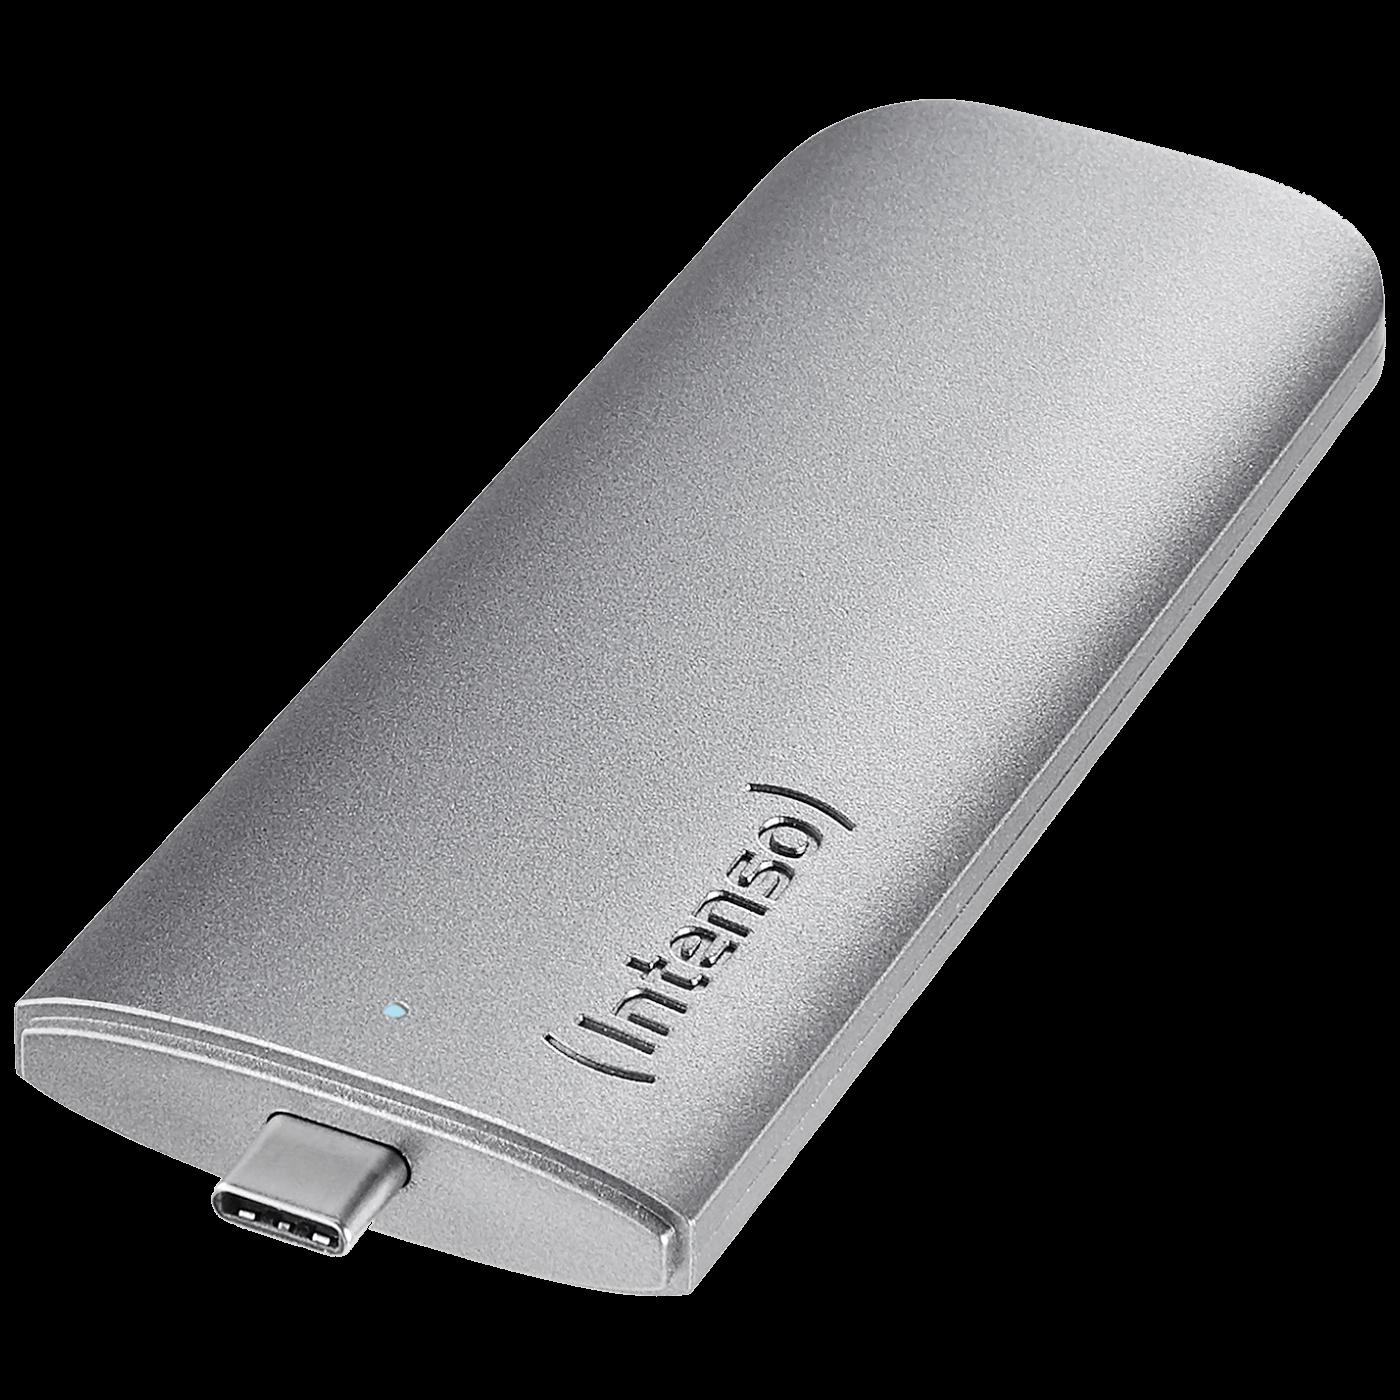 Eksterni SSD, kapacitet 500GB, USB 3.1